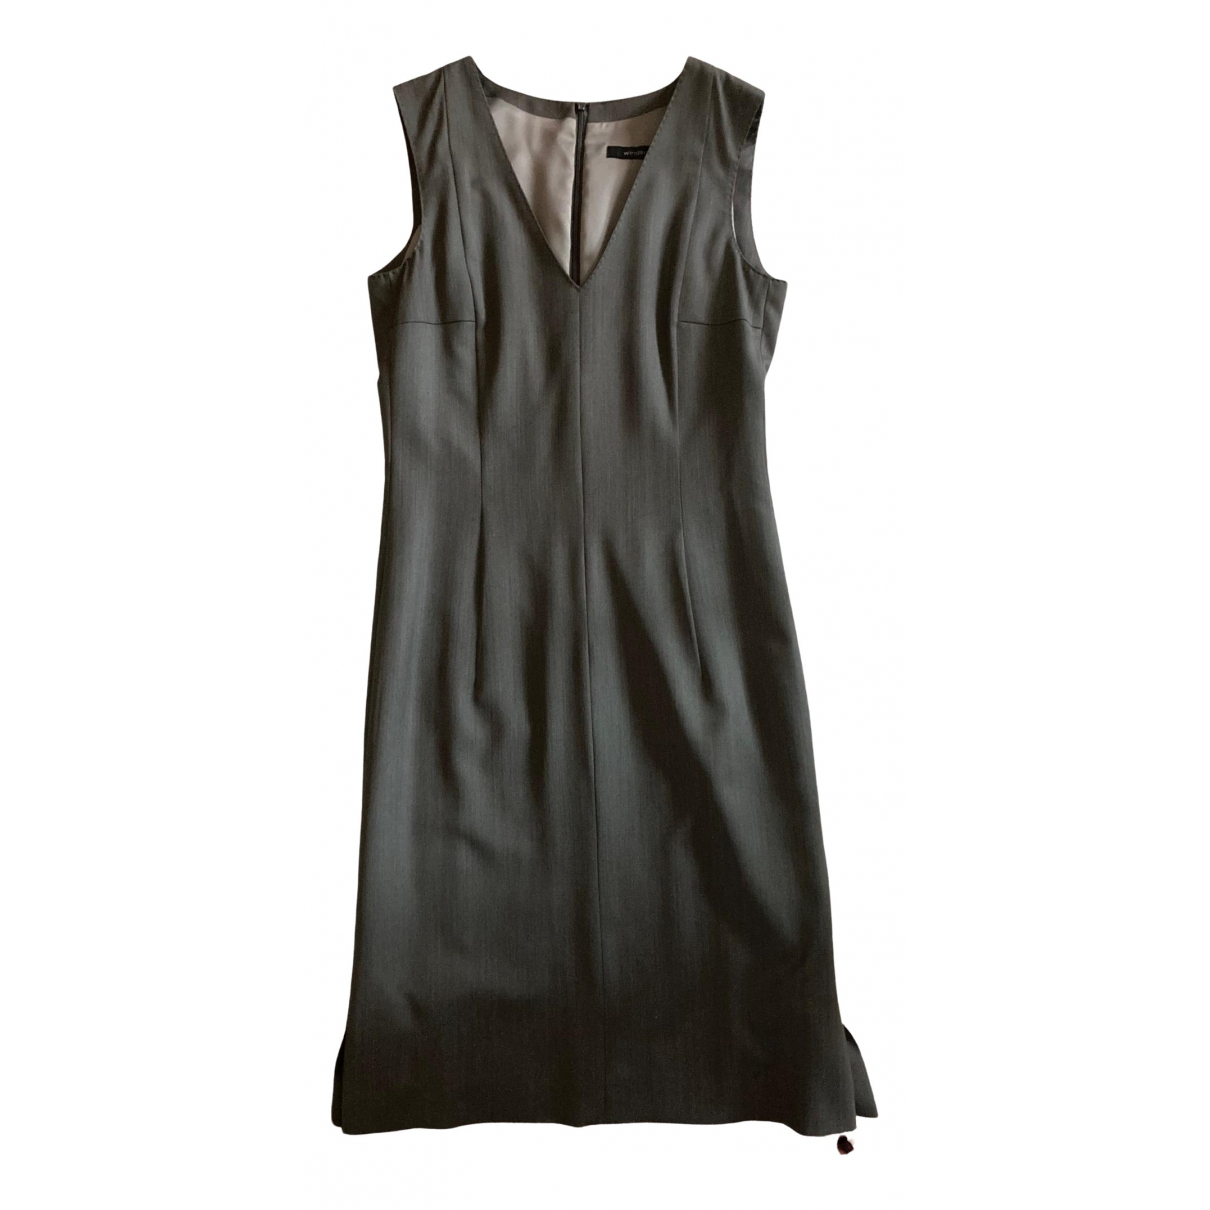 Windsor \N Kleid in  Gruen Wolle